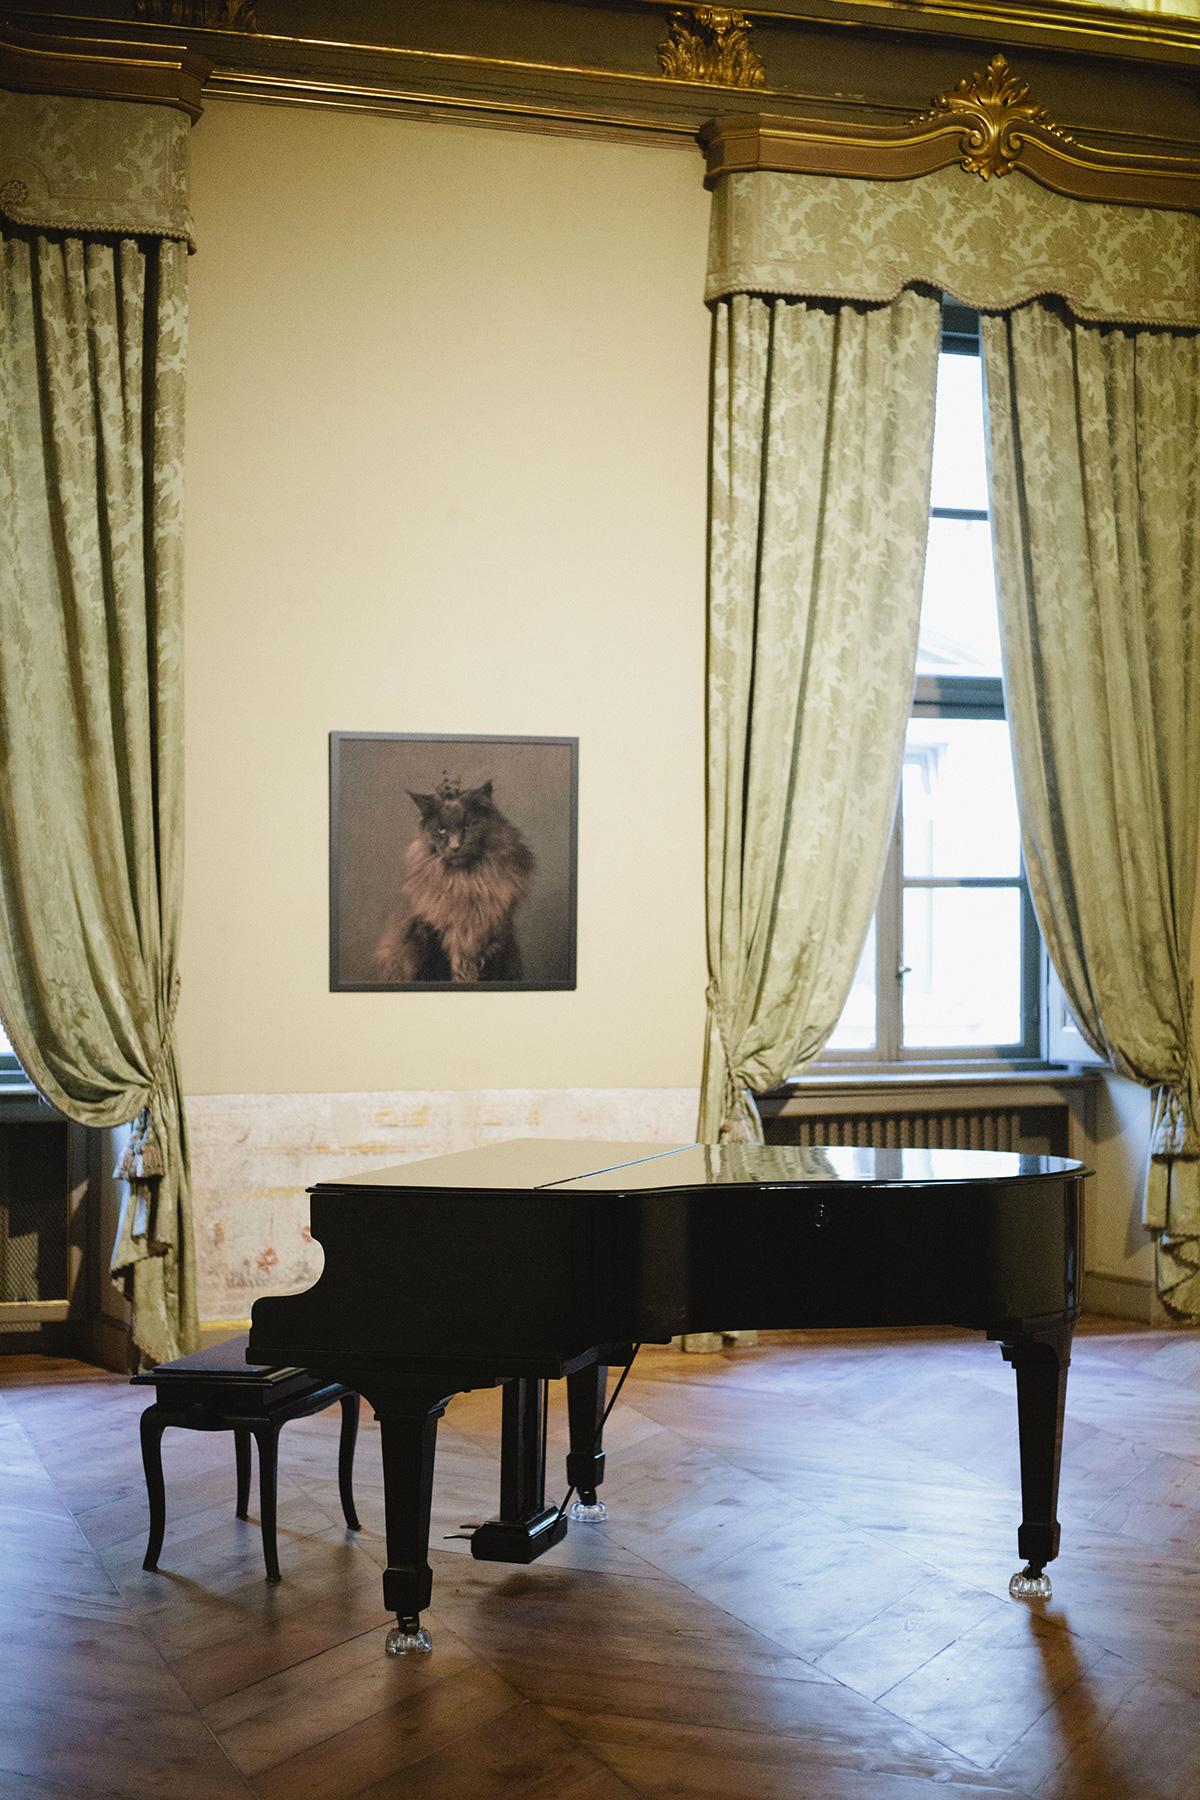 Mostre di arte contemporanea a Torino